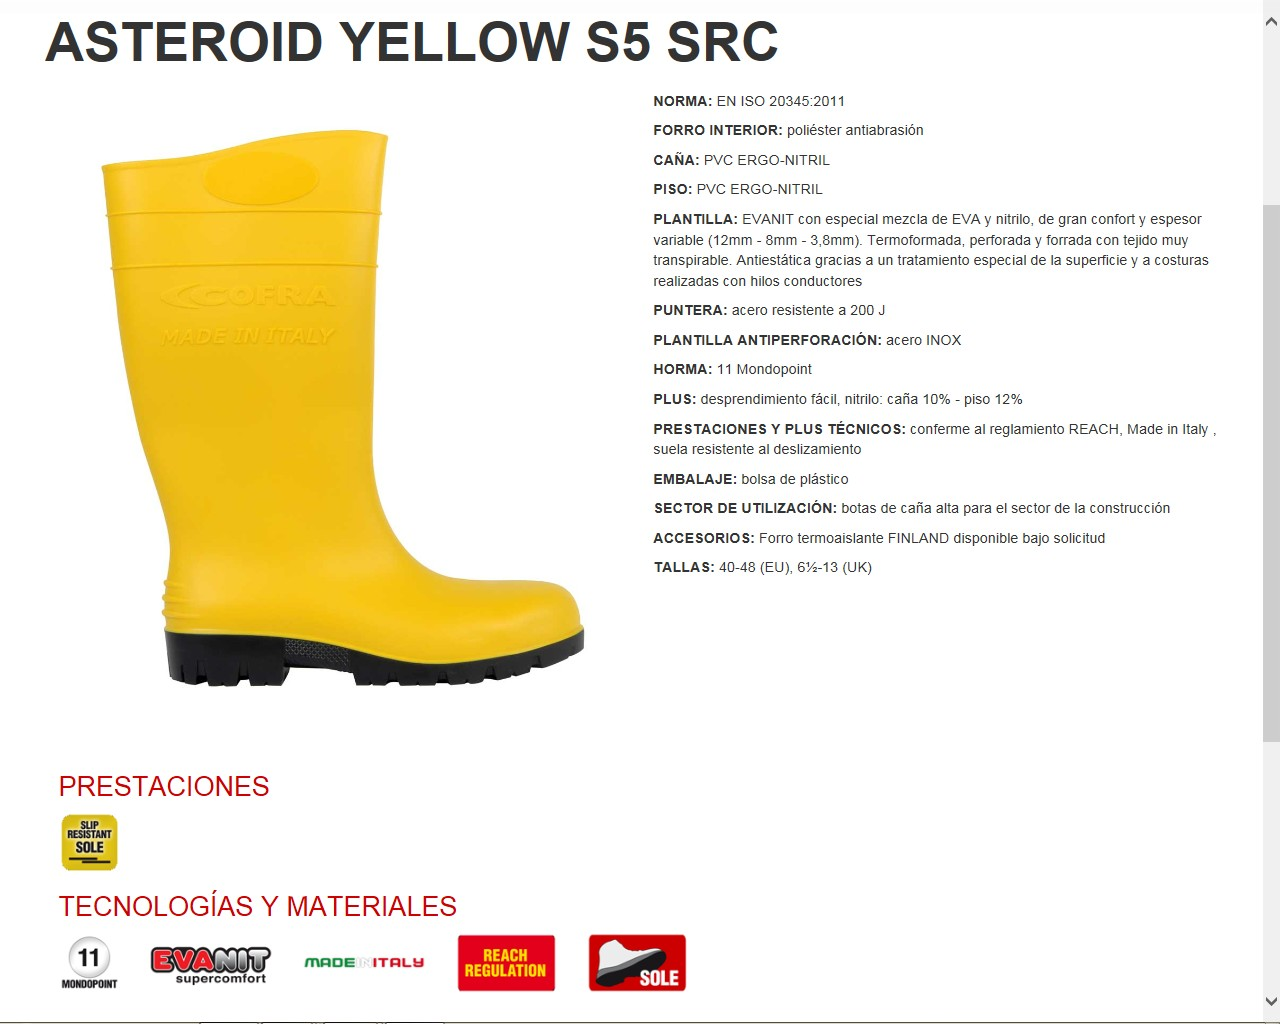 8a73d7b735f BOTA ASTEROID GREEN S5 SRC NORMA: EN ISO 20345:2011